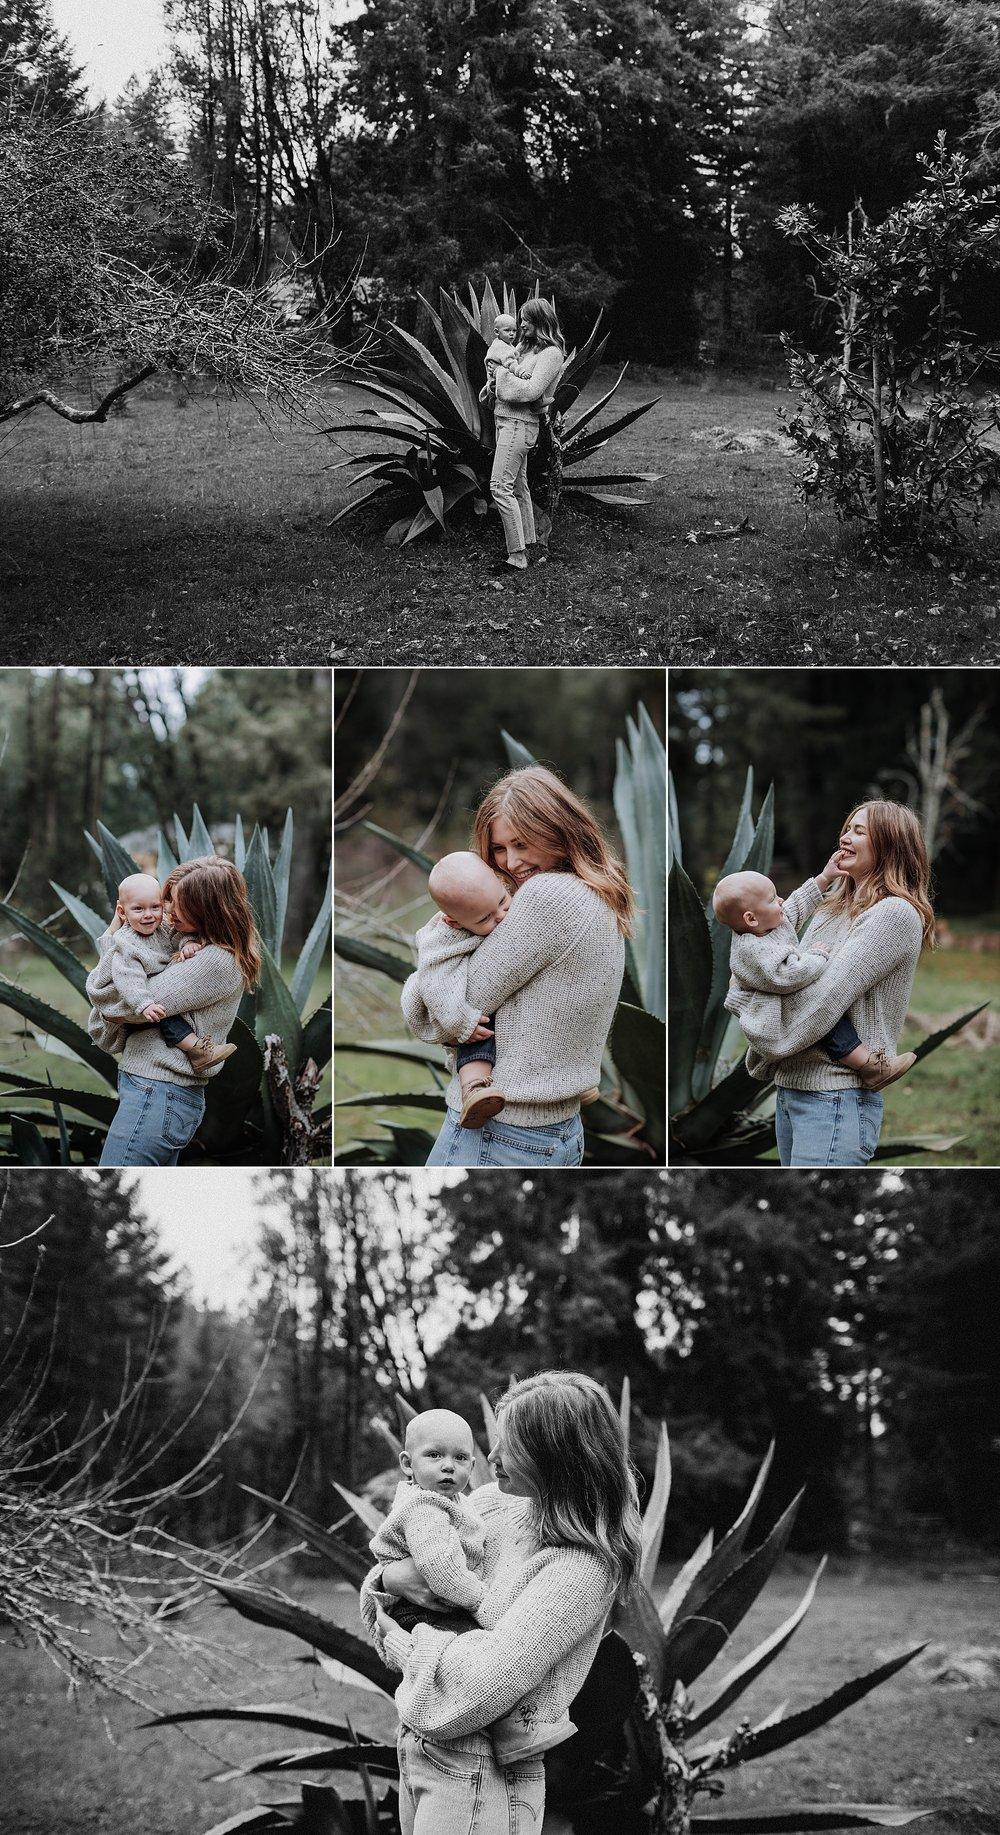 Sebastopol Family Photography   Gretchen Gause   #bayareafamilyphotographer #Doen #Mamaandme #stlyishmama #mamaandbaby #shopdoen #familyphotos #mamaandmesession